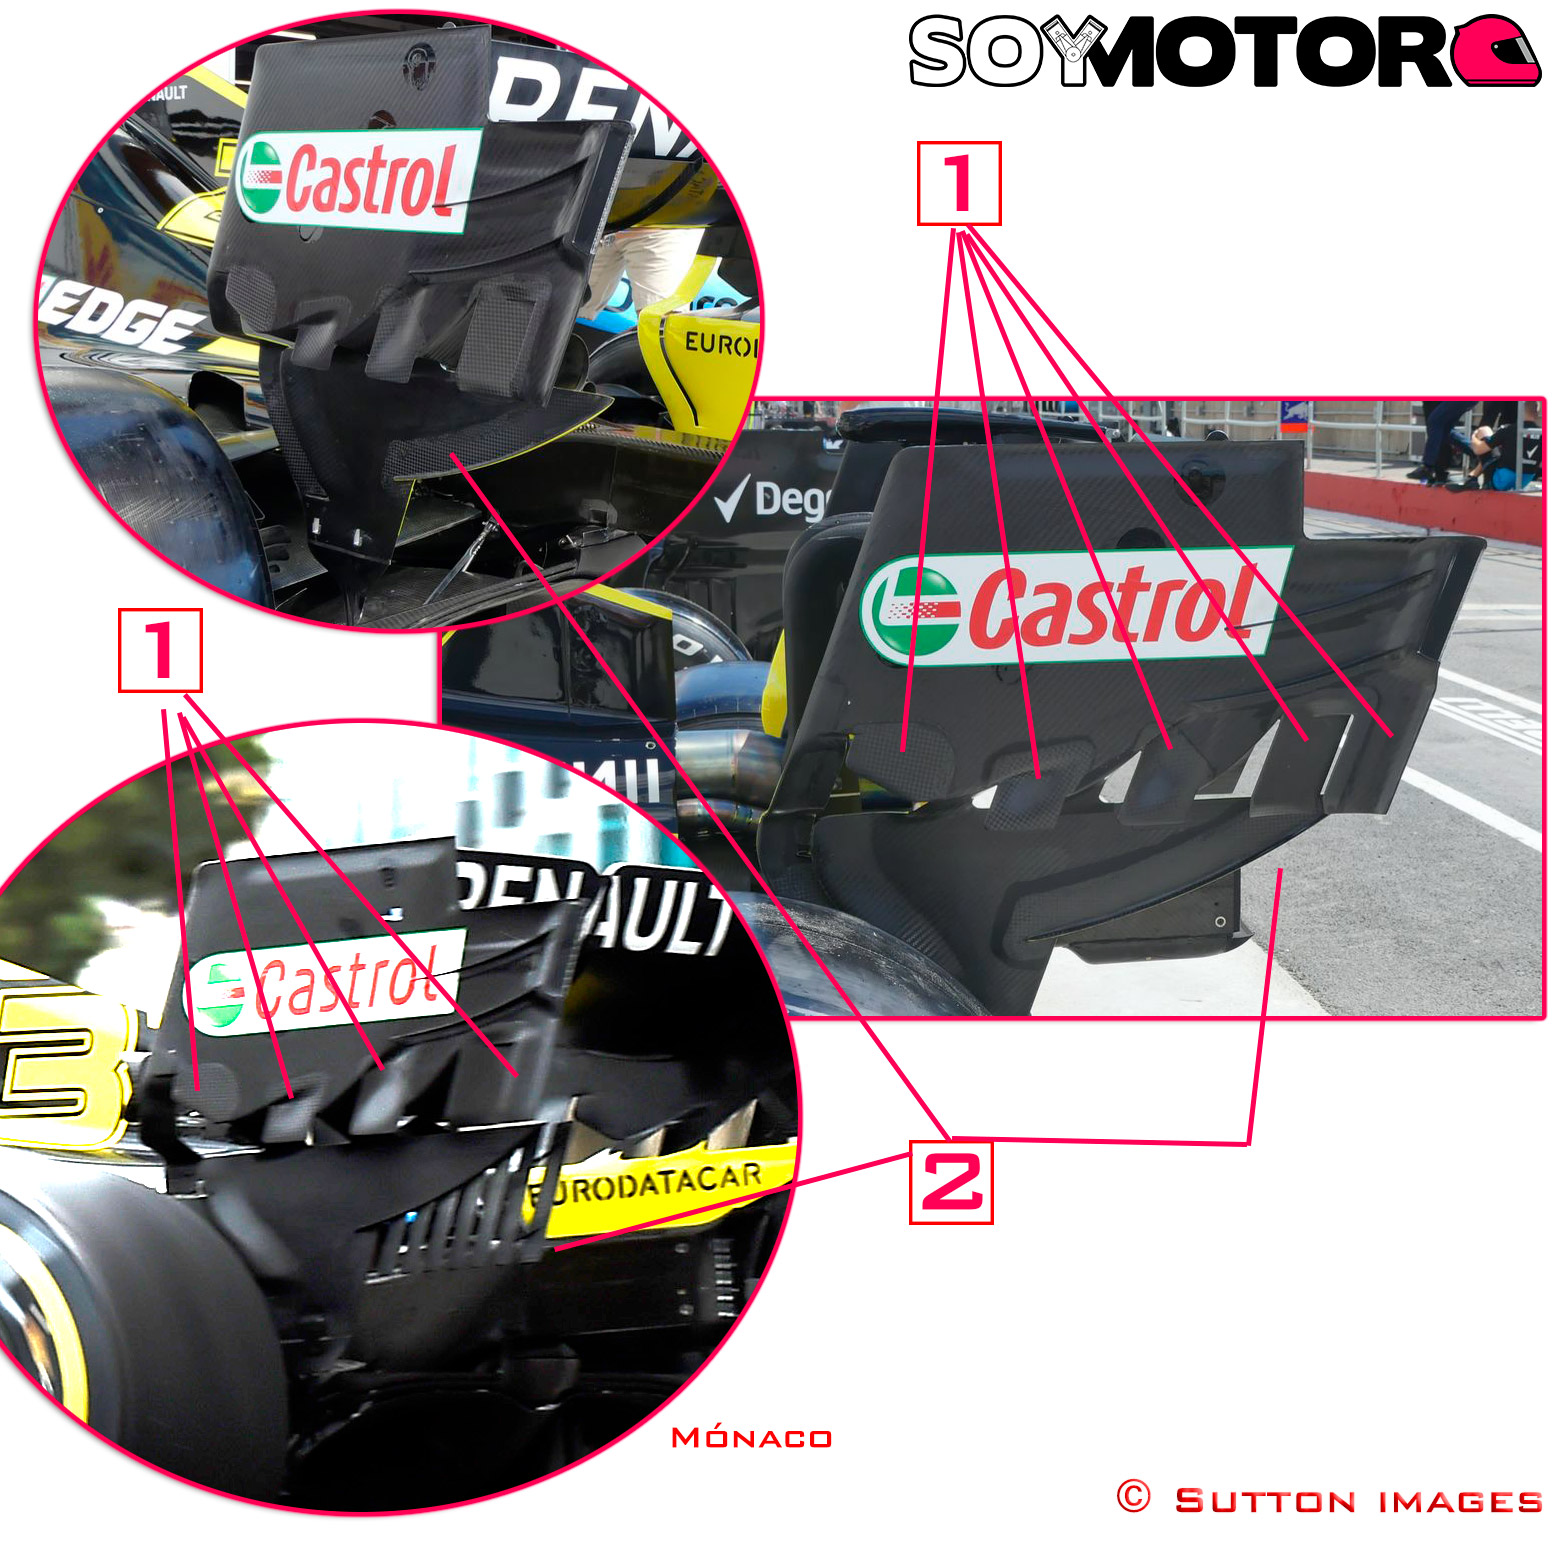 renault-aleron-trasero-nuevo-endplate-soymotor.jpg